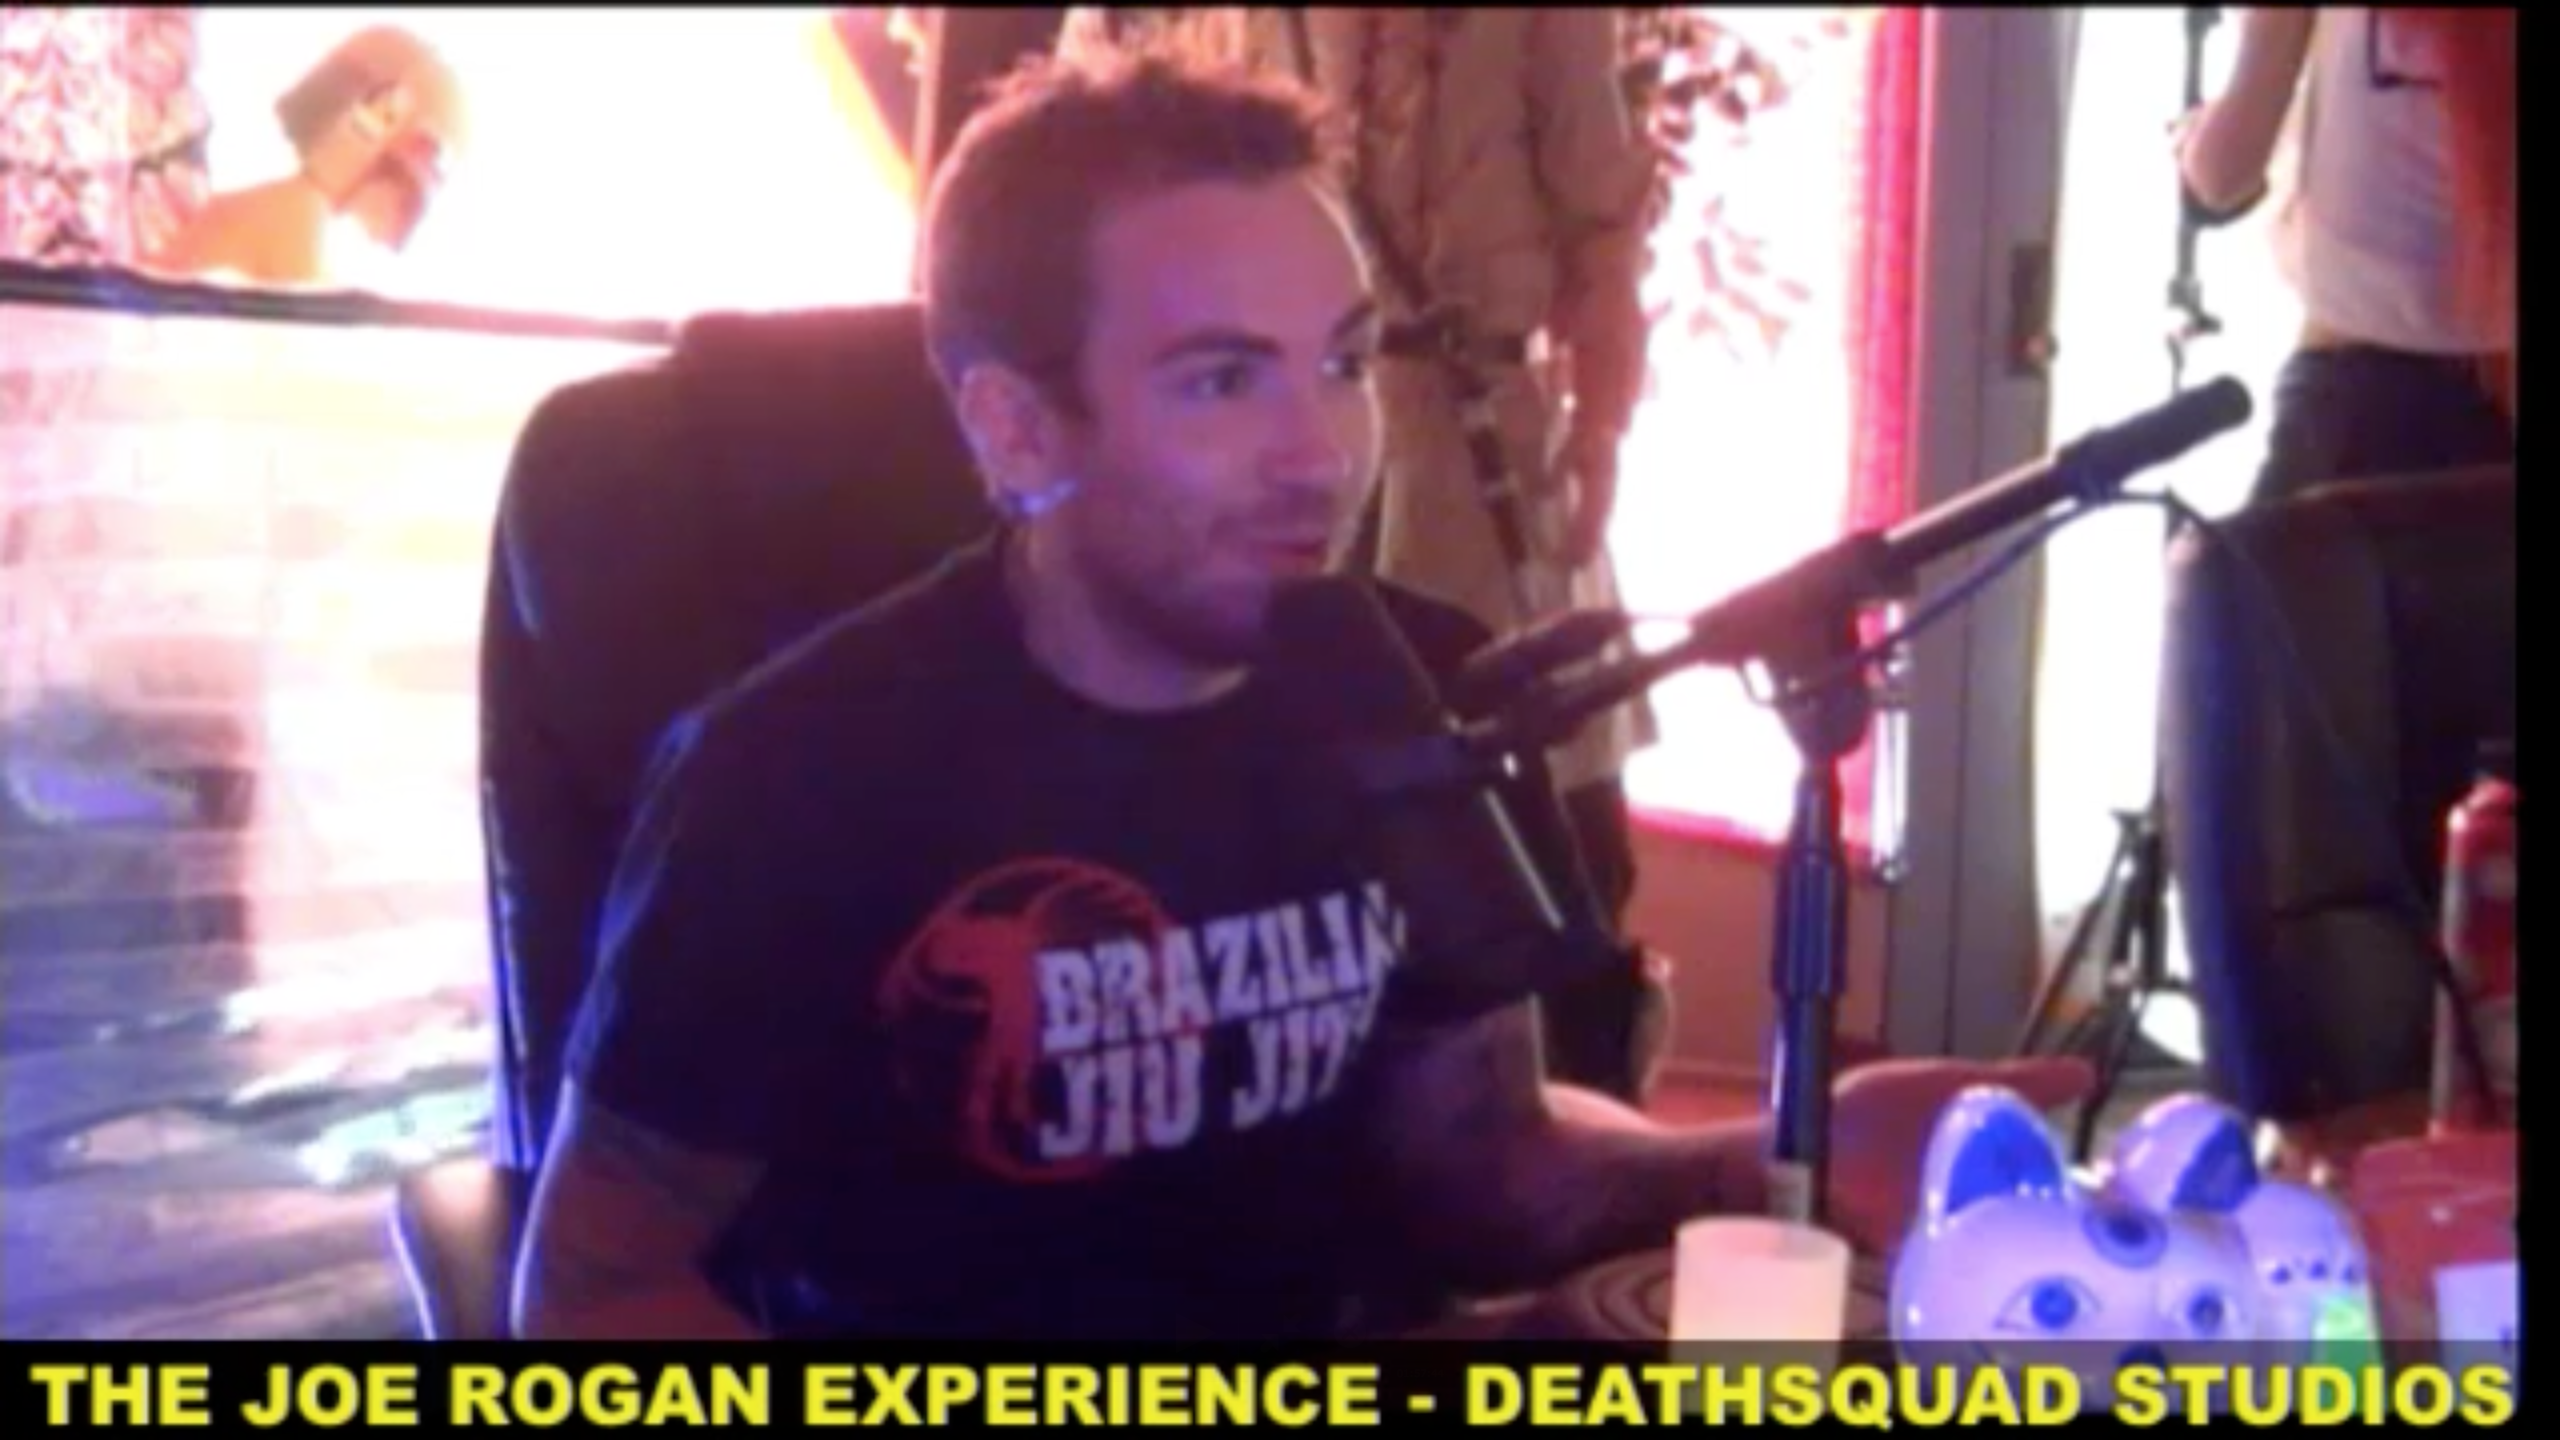 The Joe Rogan Experience #252 - Jamie Kilstein, Brian Redban